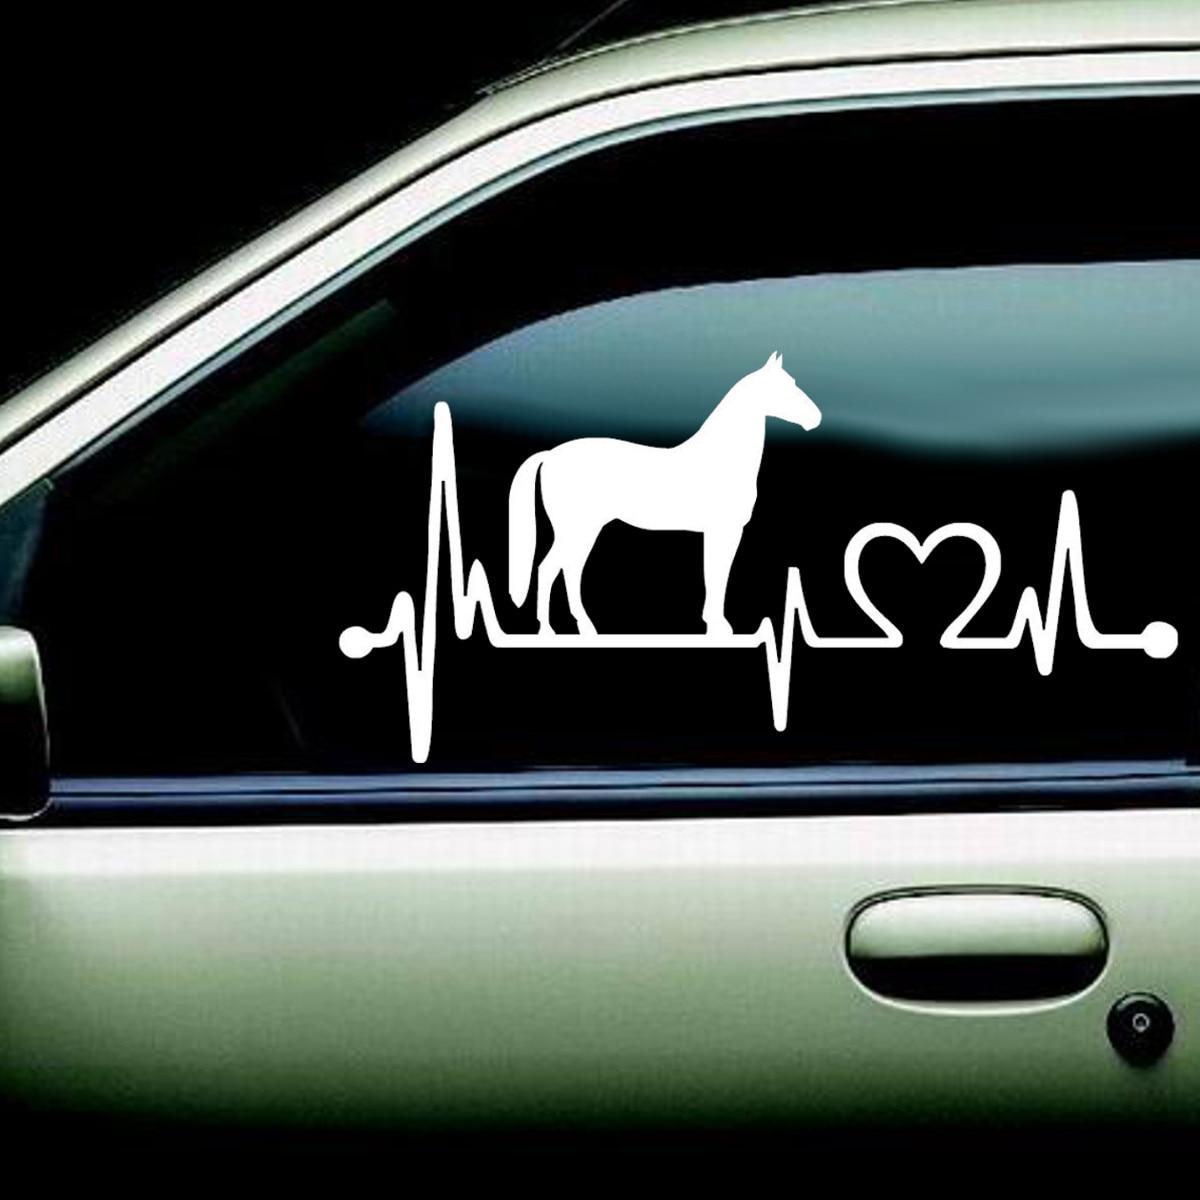 Hot Seller Window Sticker Wall Horse With Cartoon Electrocardiogram